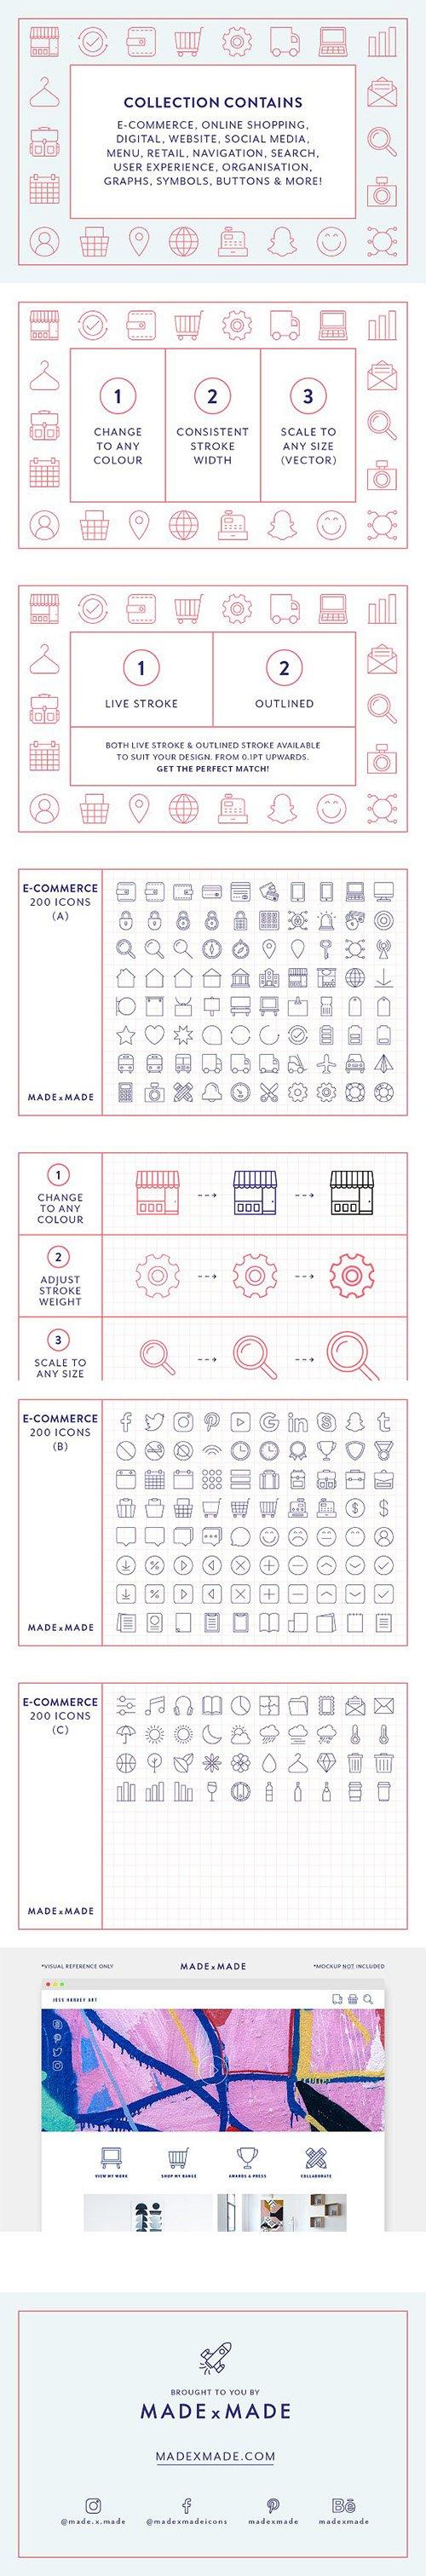 200 ECommerce Line Icons